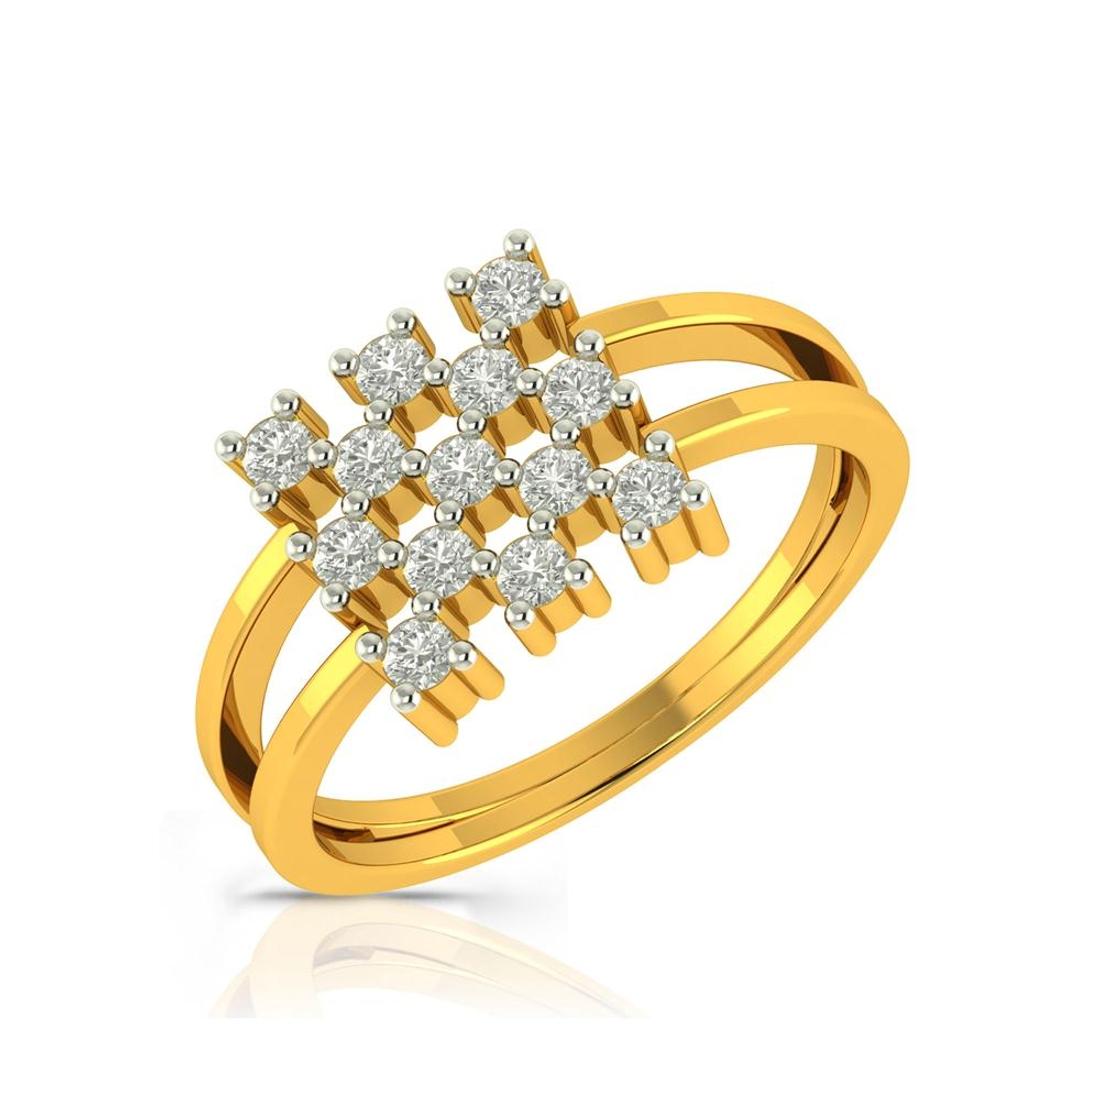 Buy Charu Jewels Diamond Ladies Ring CJLR0233 Online in India